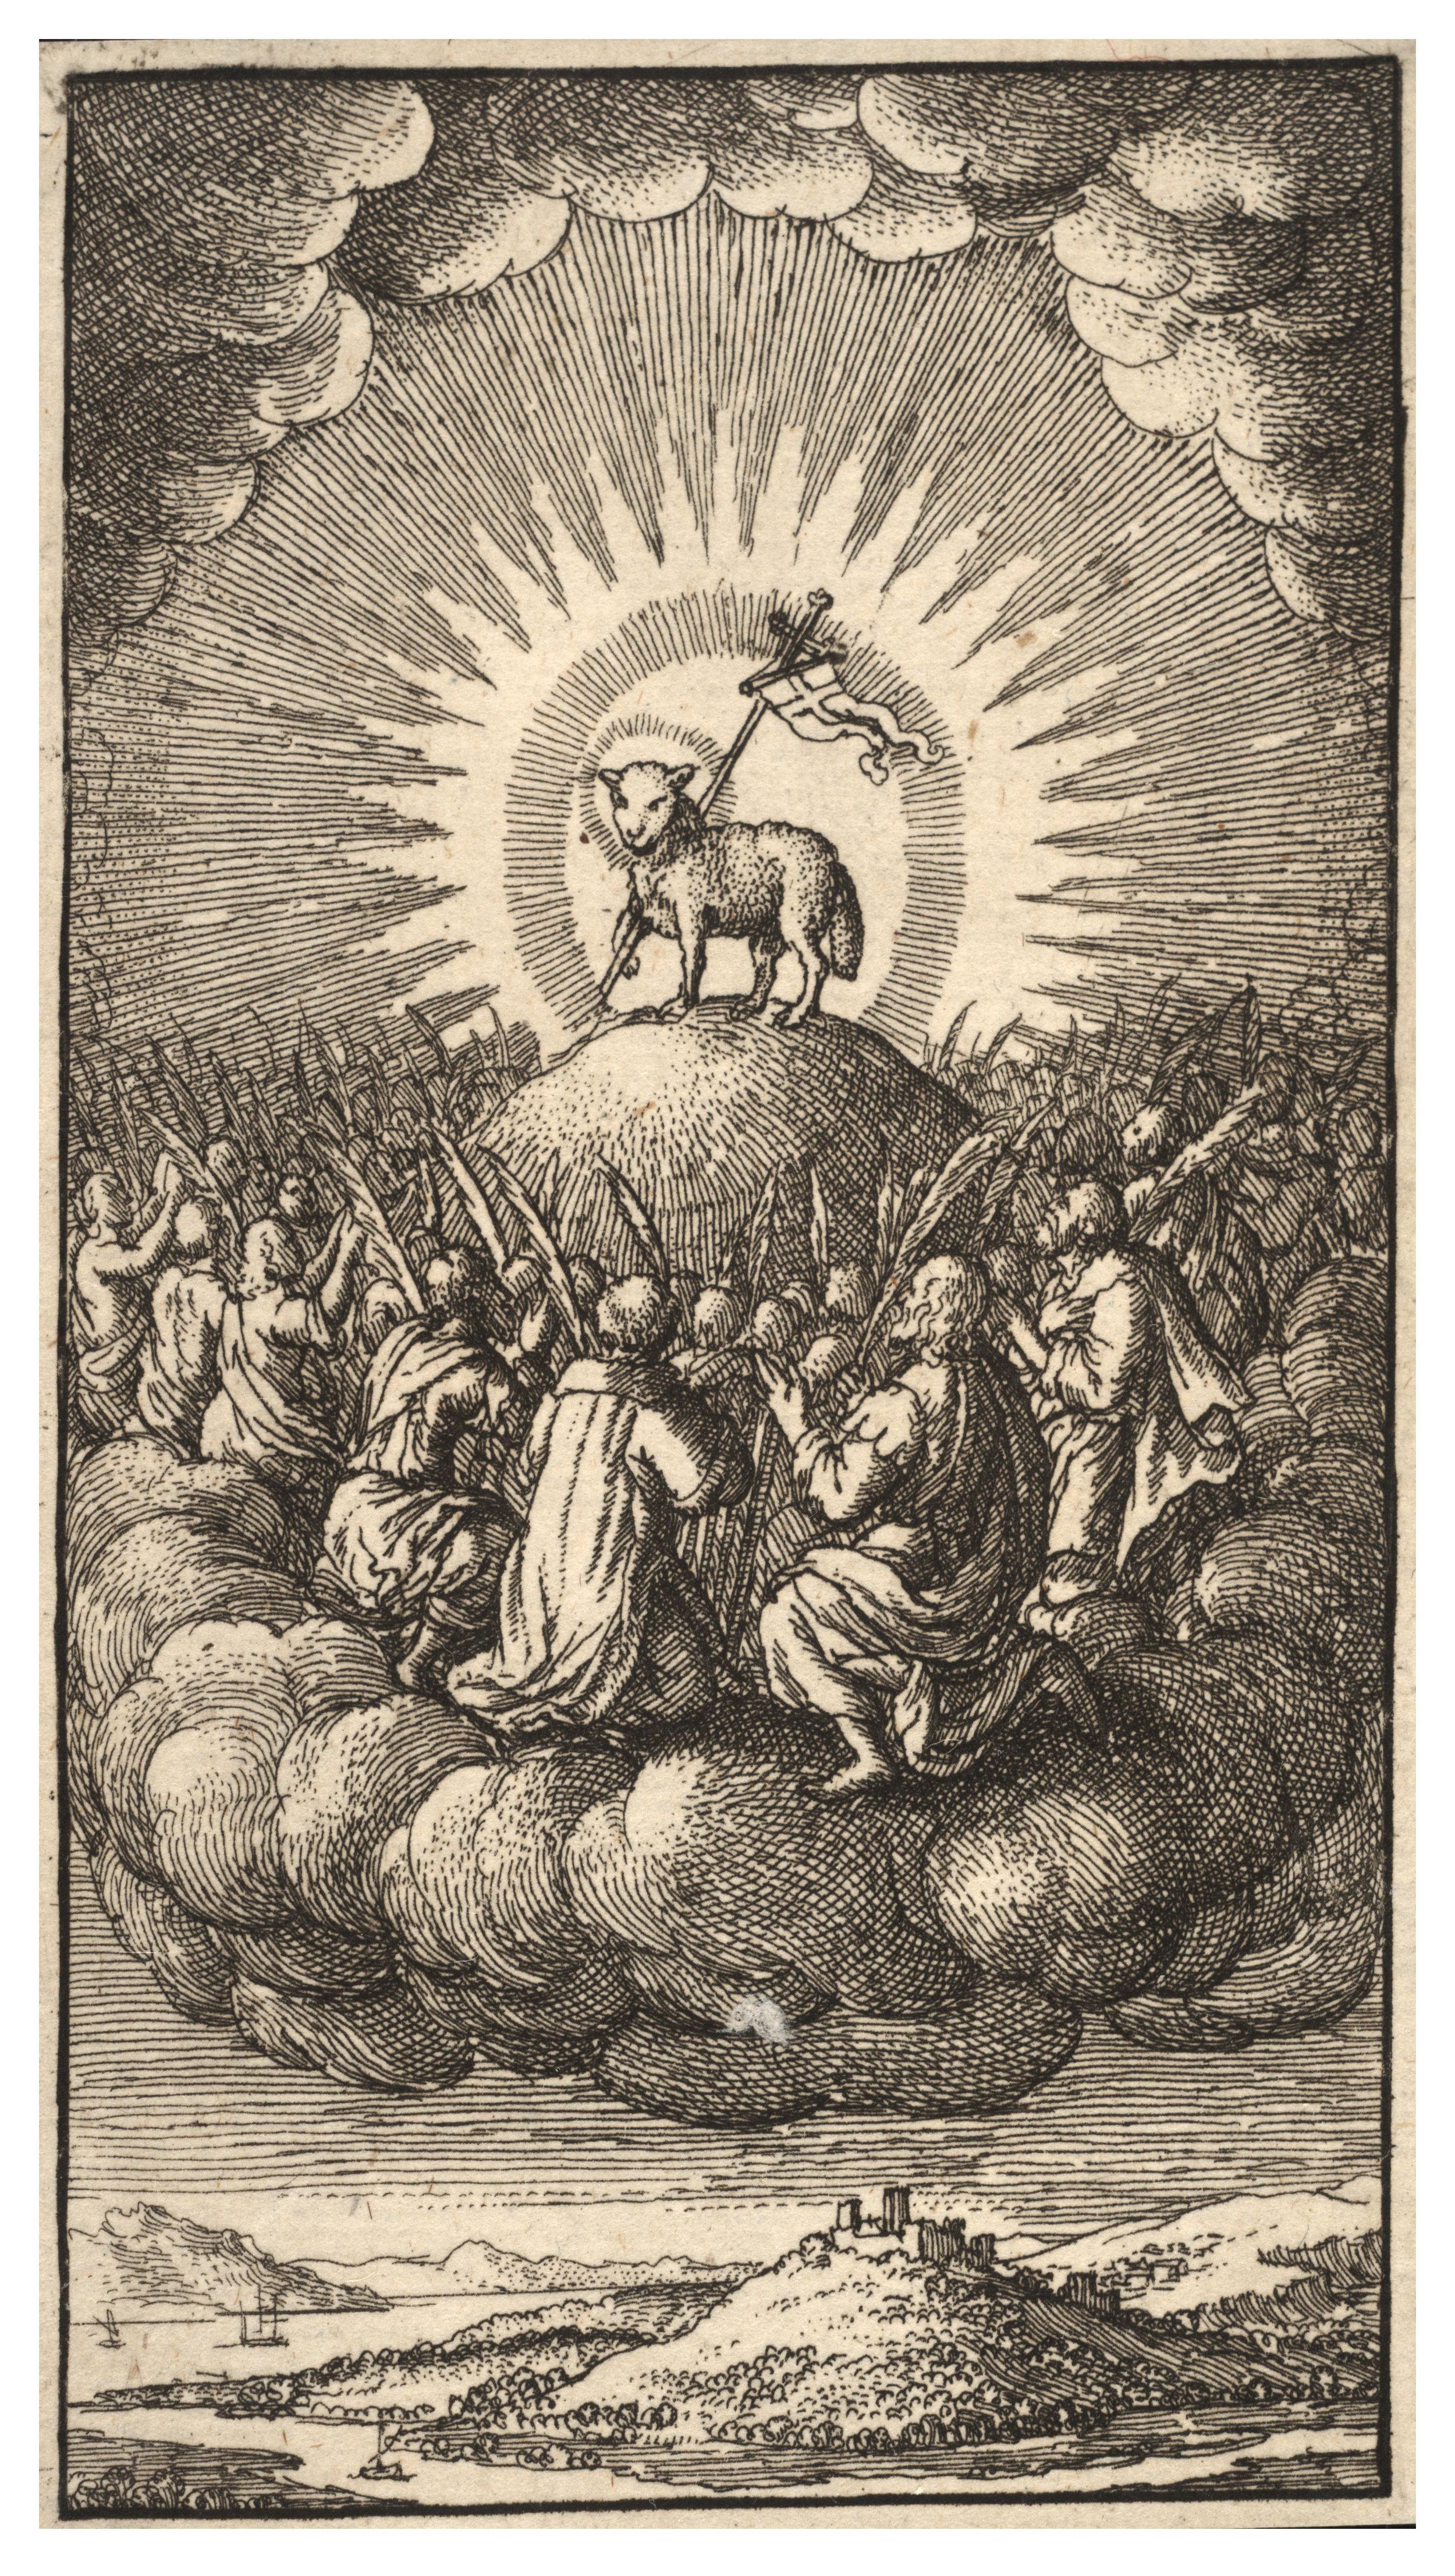 Wenceslaus Hollar [Public domain]